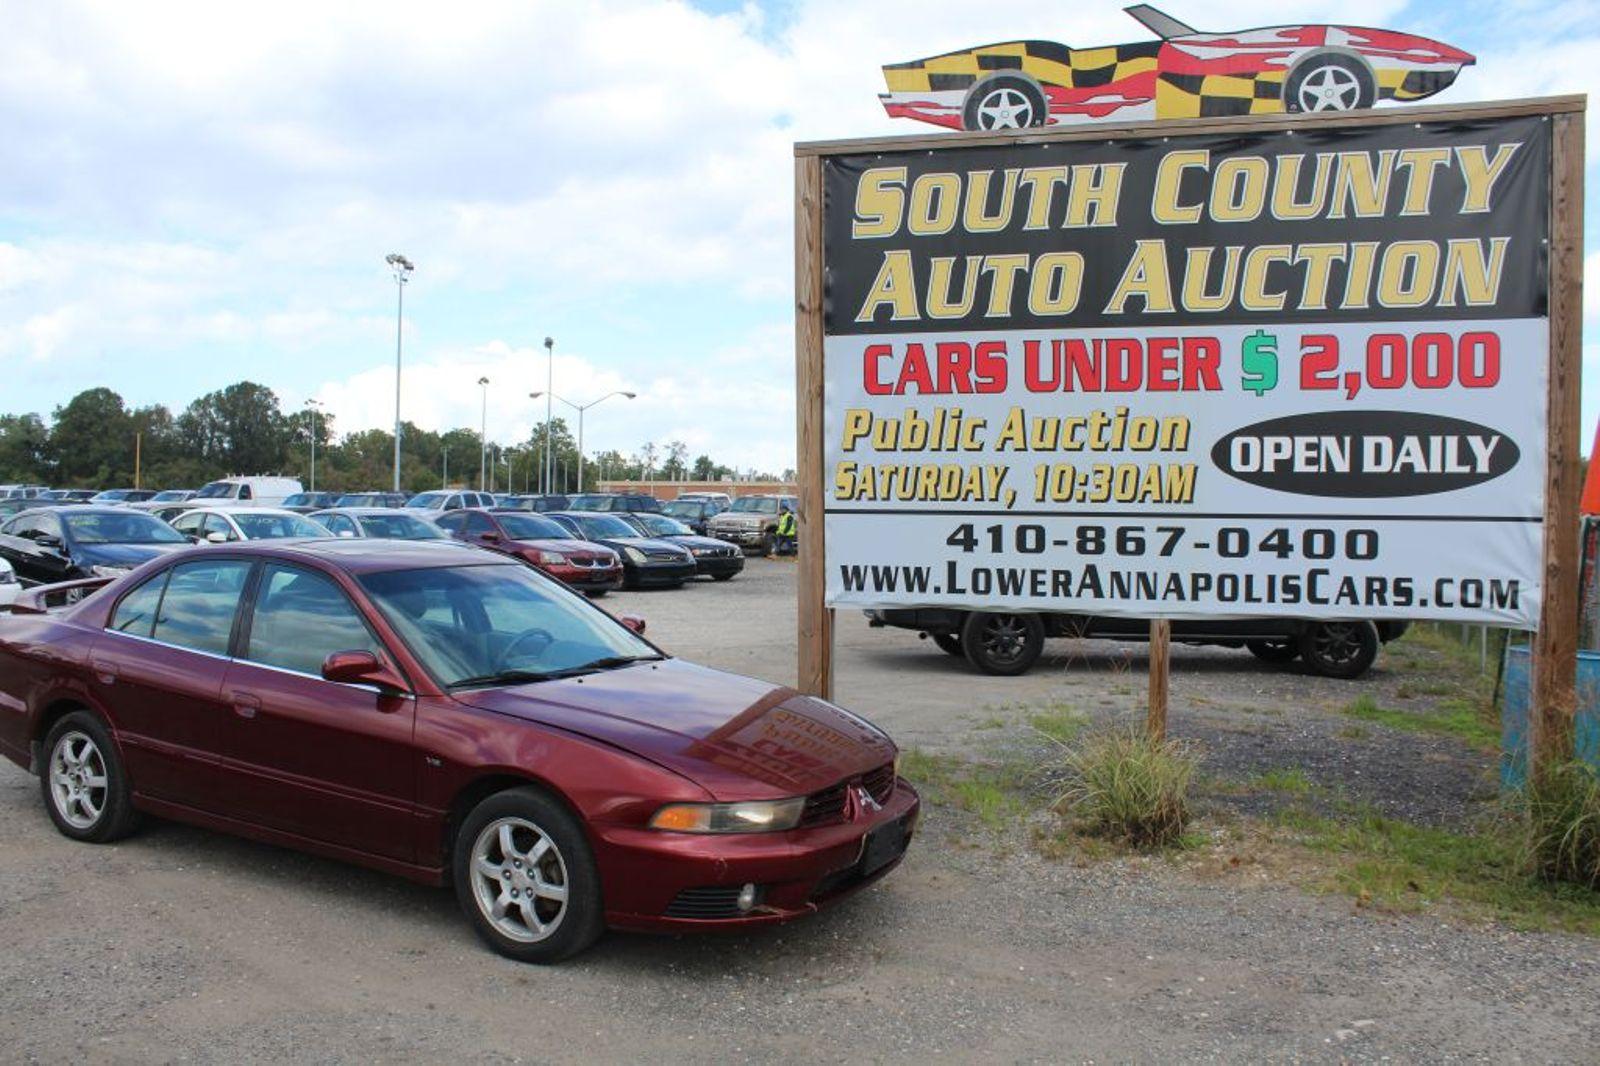 2003 Mitsubishi Galant Es City Md South County Public Auto Auction